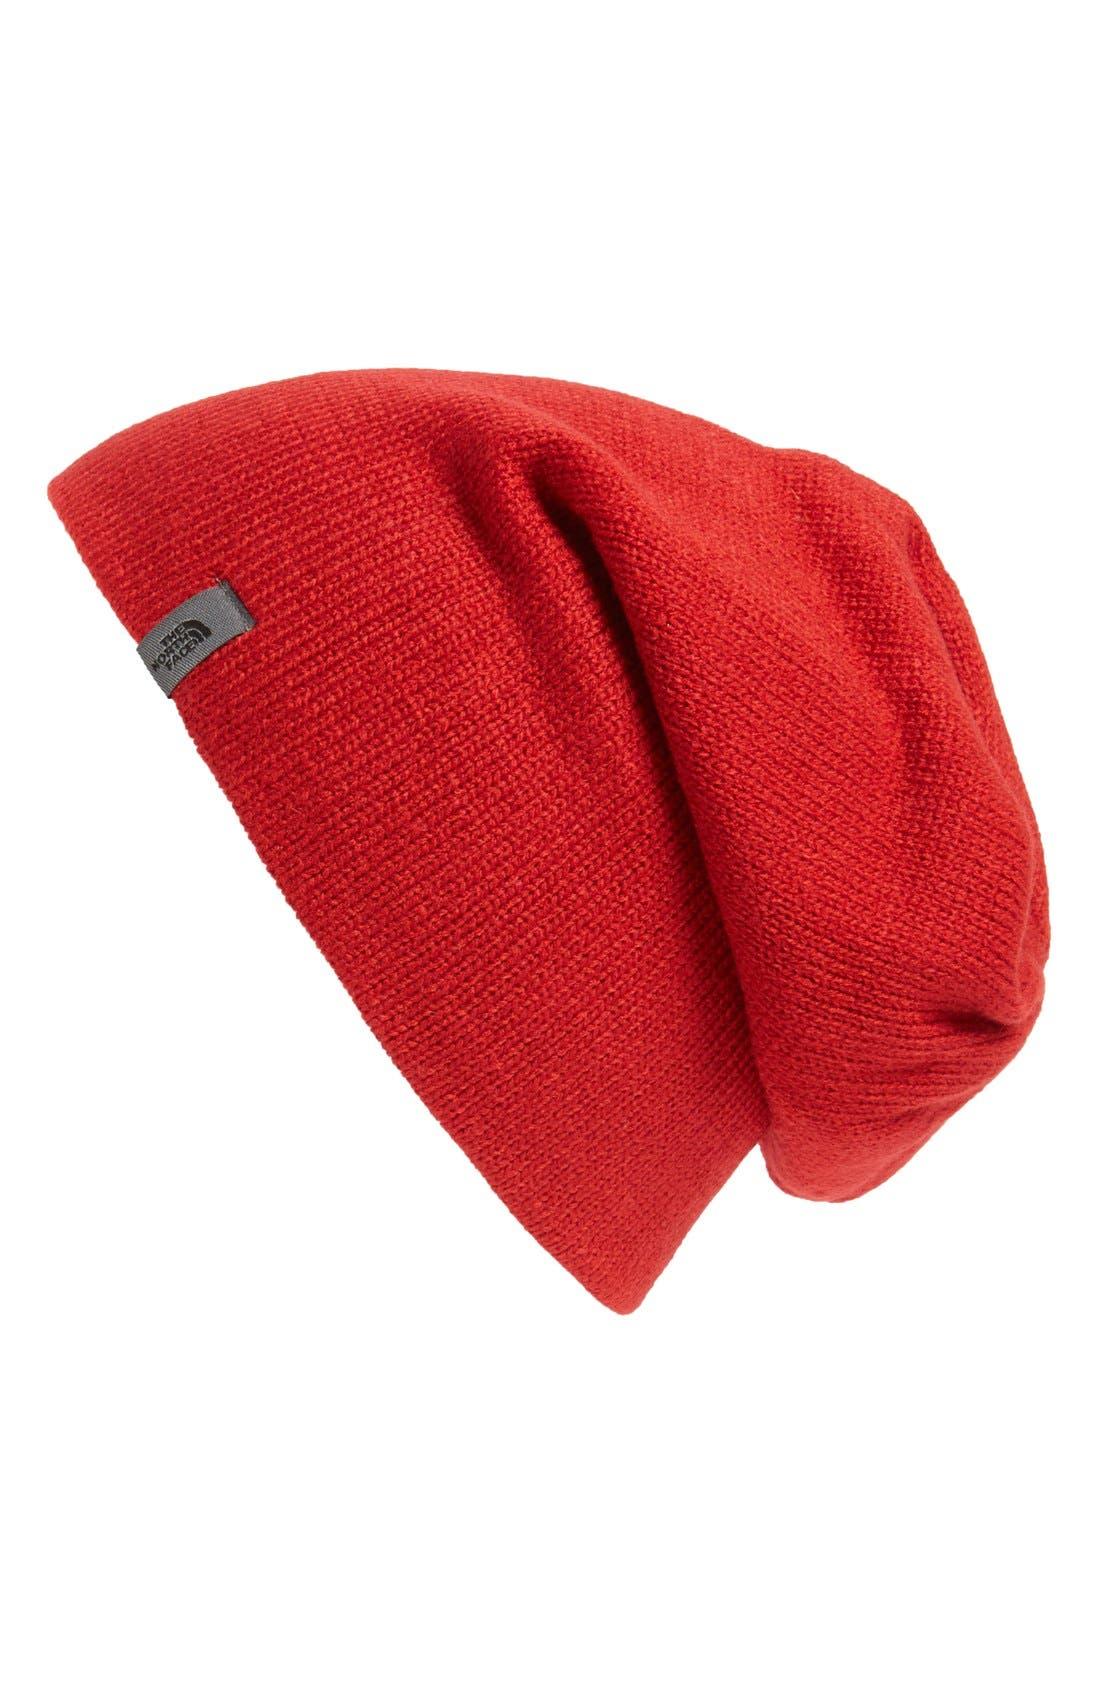 Main Image - The North Face 'Any Grade' Knit Cap